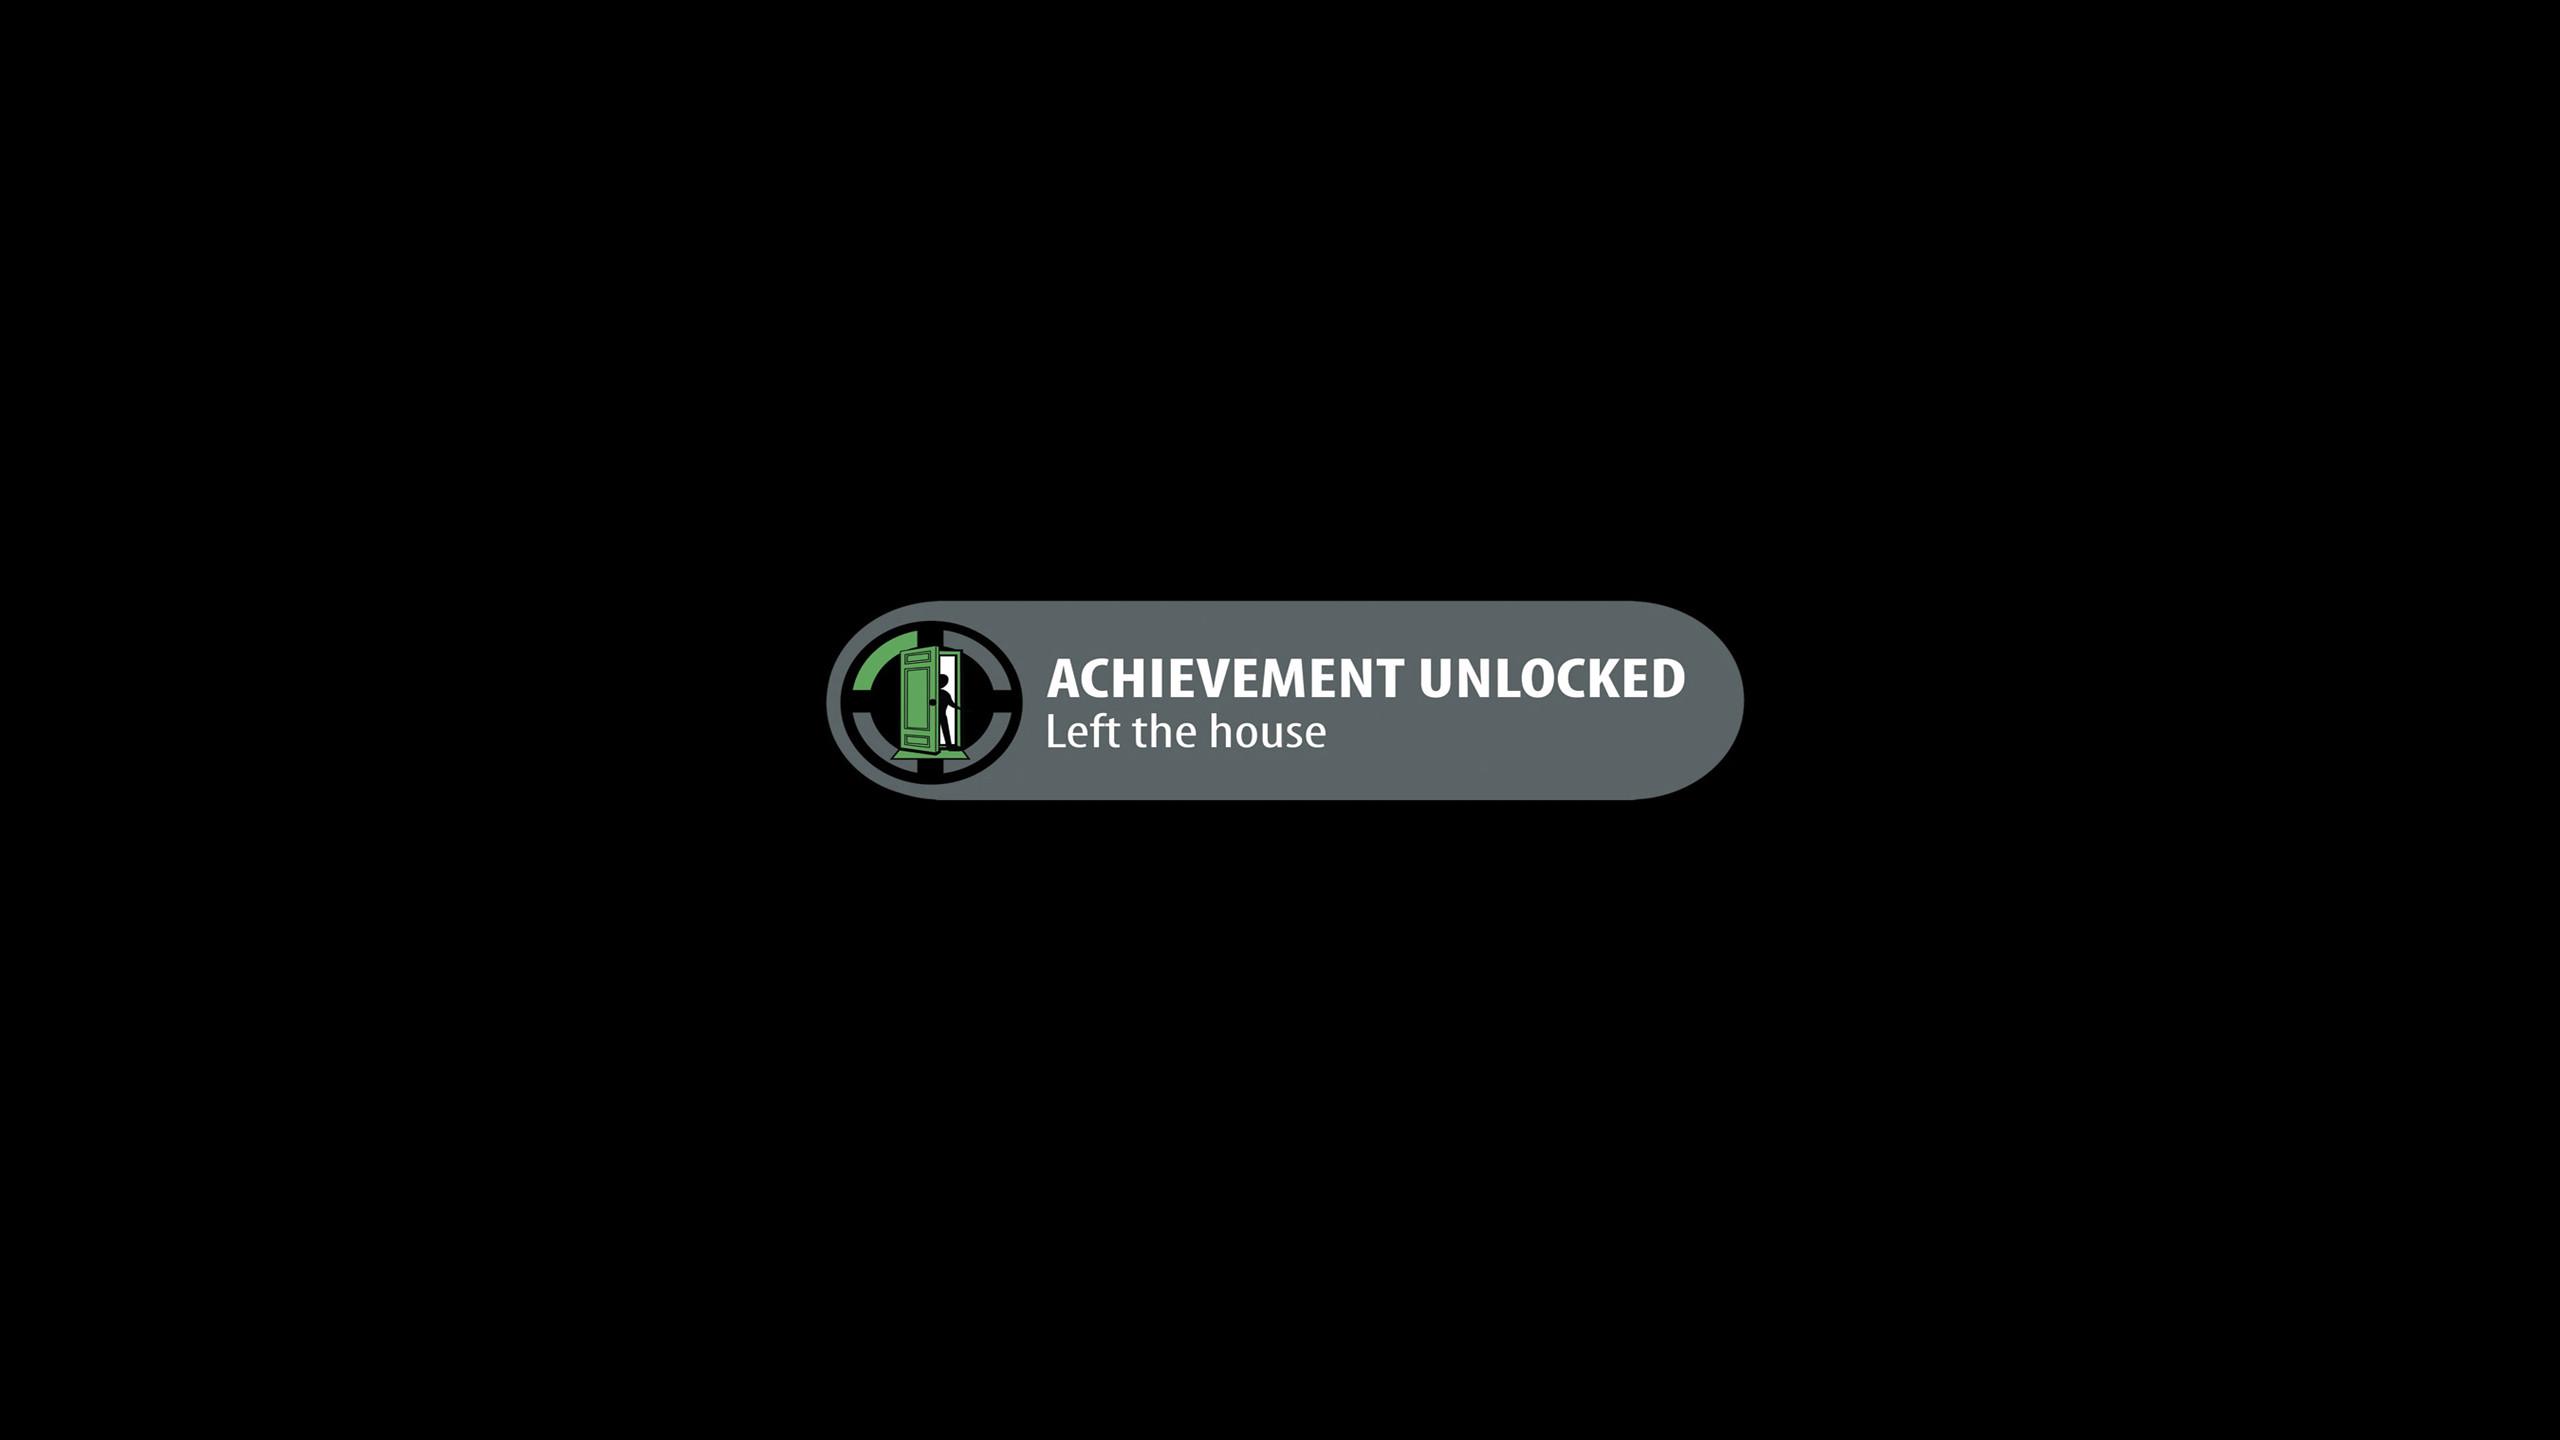 Xbox One Achievement Wallpaper 89 Images